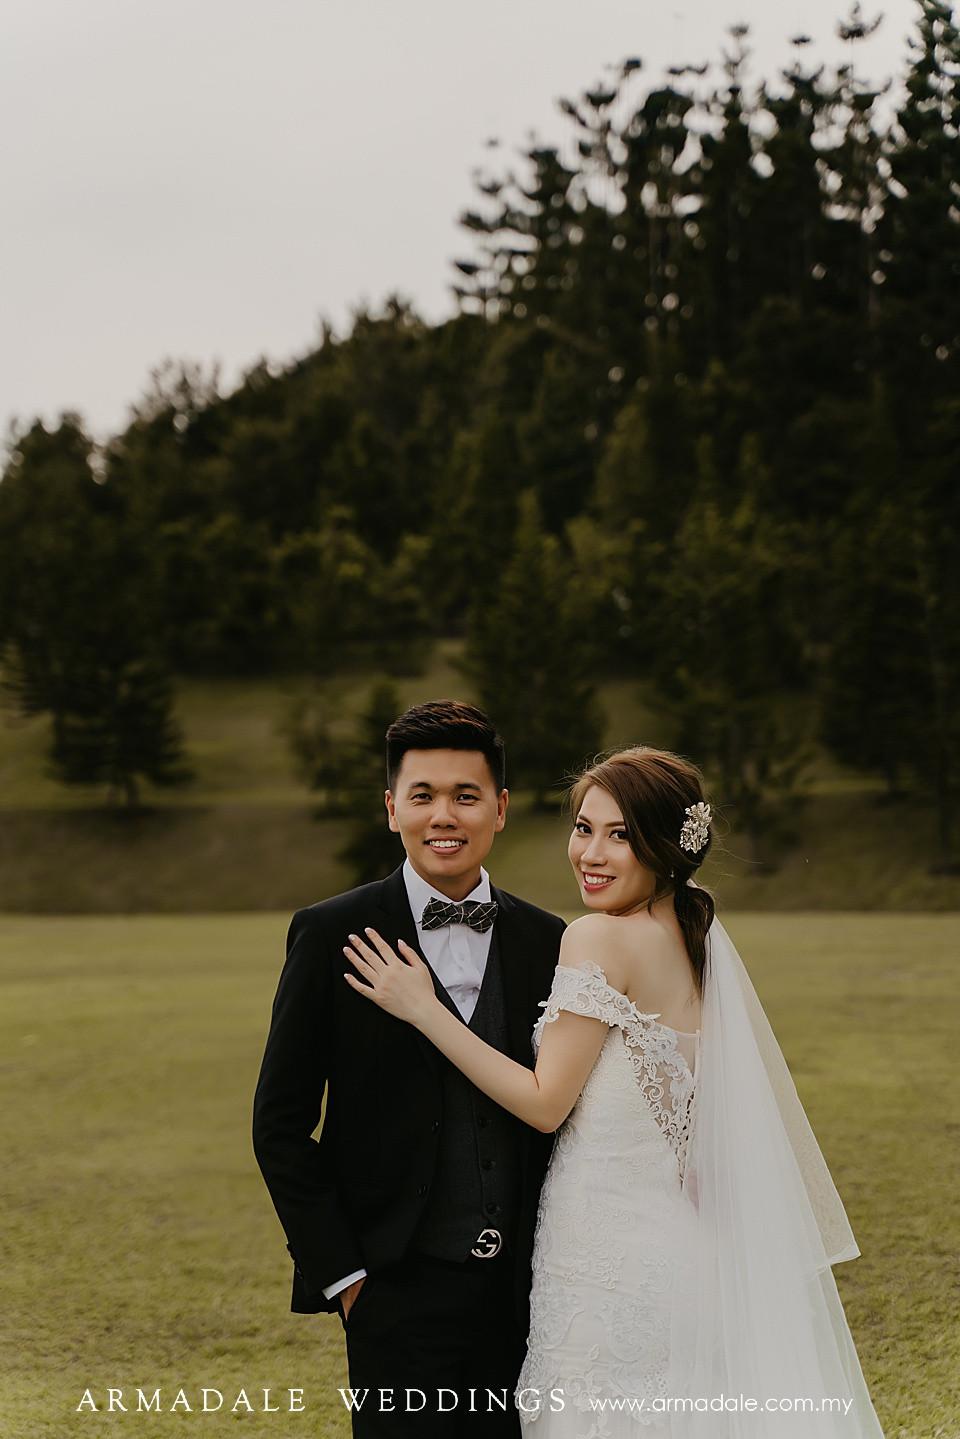 Pre-Wedding photoshoot in Putrajaya, KL